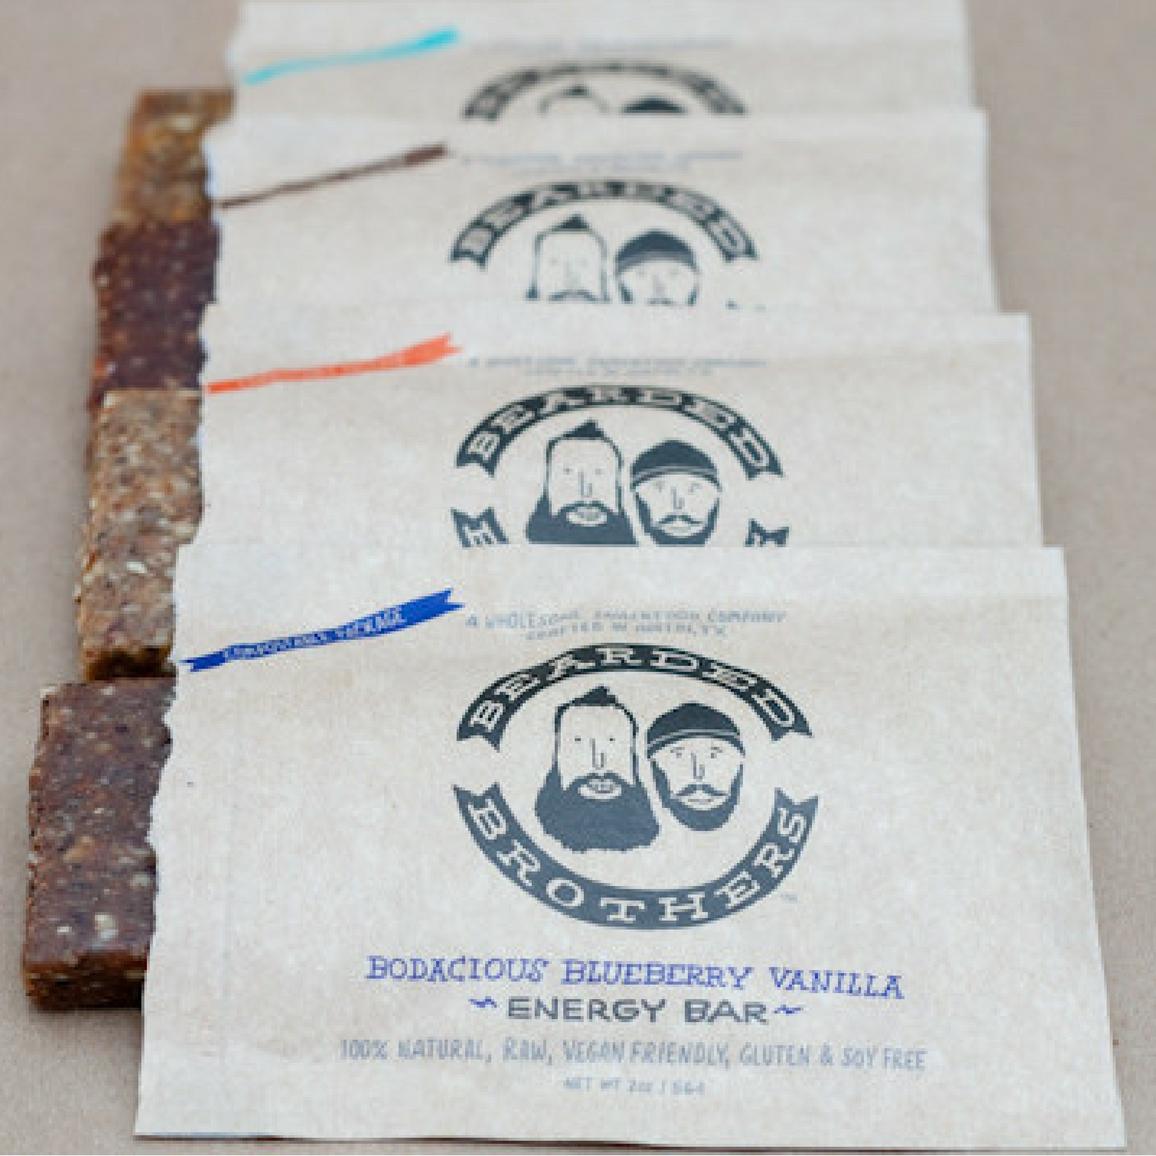 Bearded Bros Brand Image (1).jpg